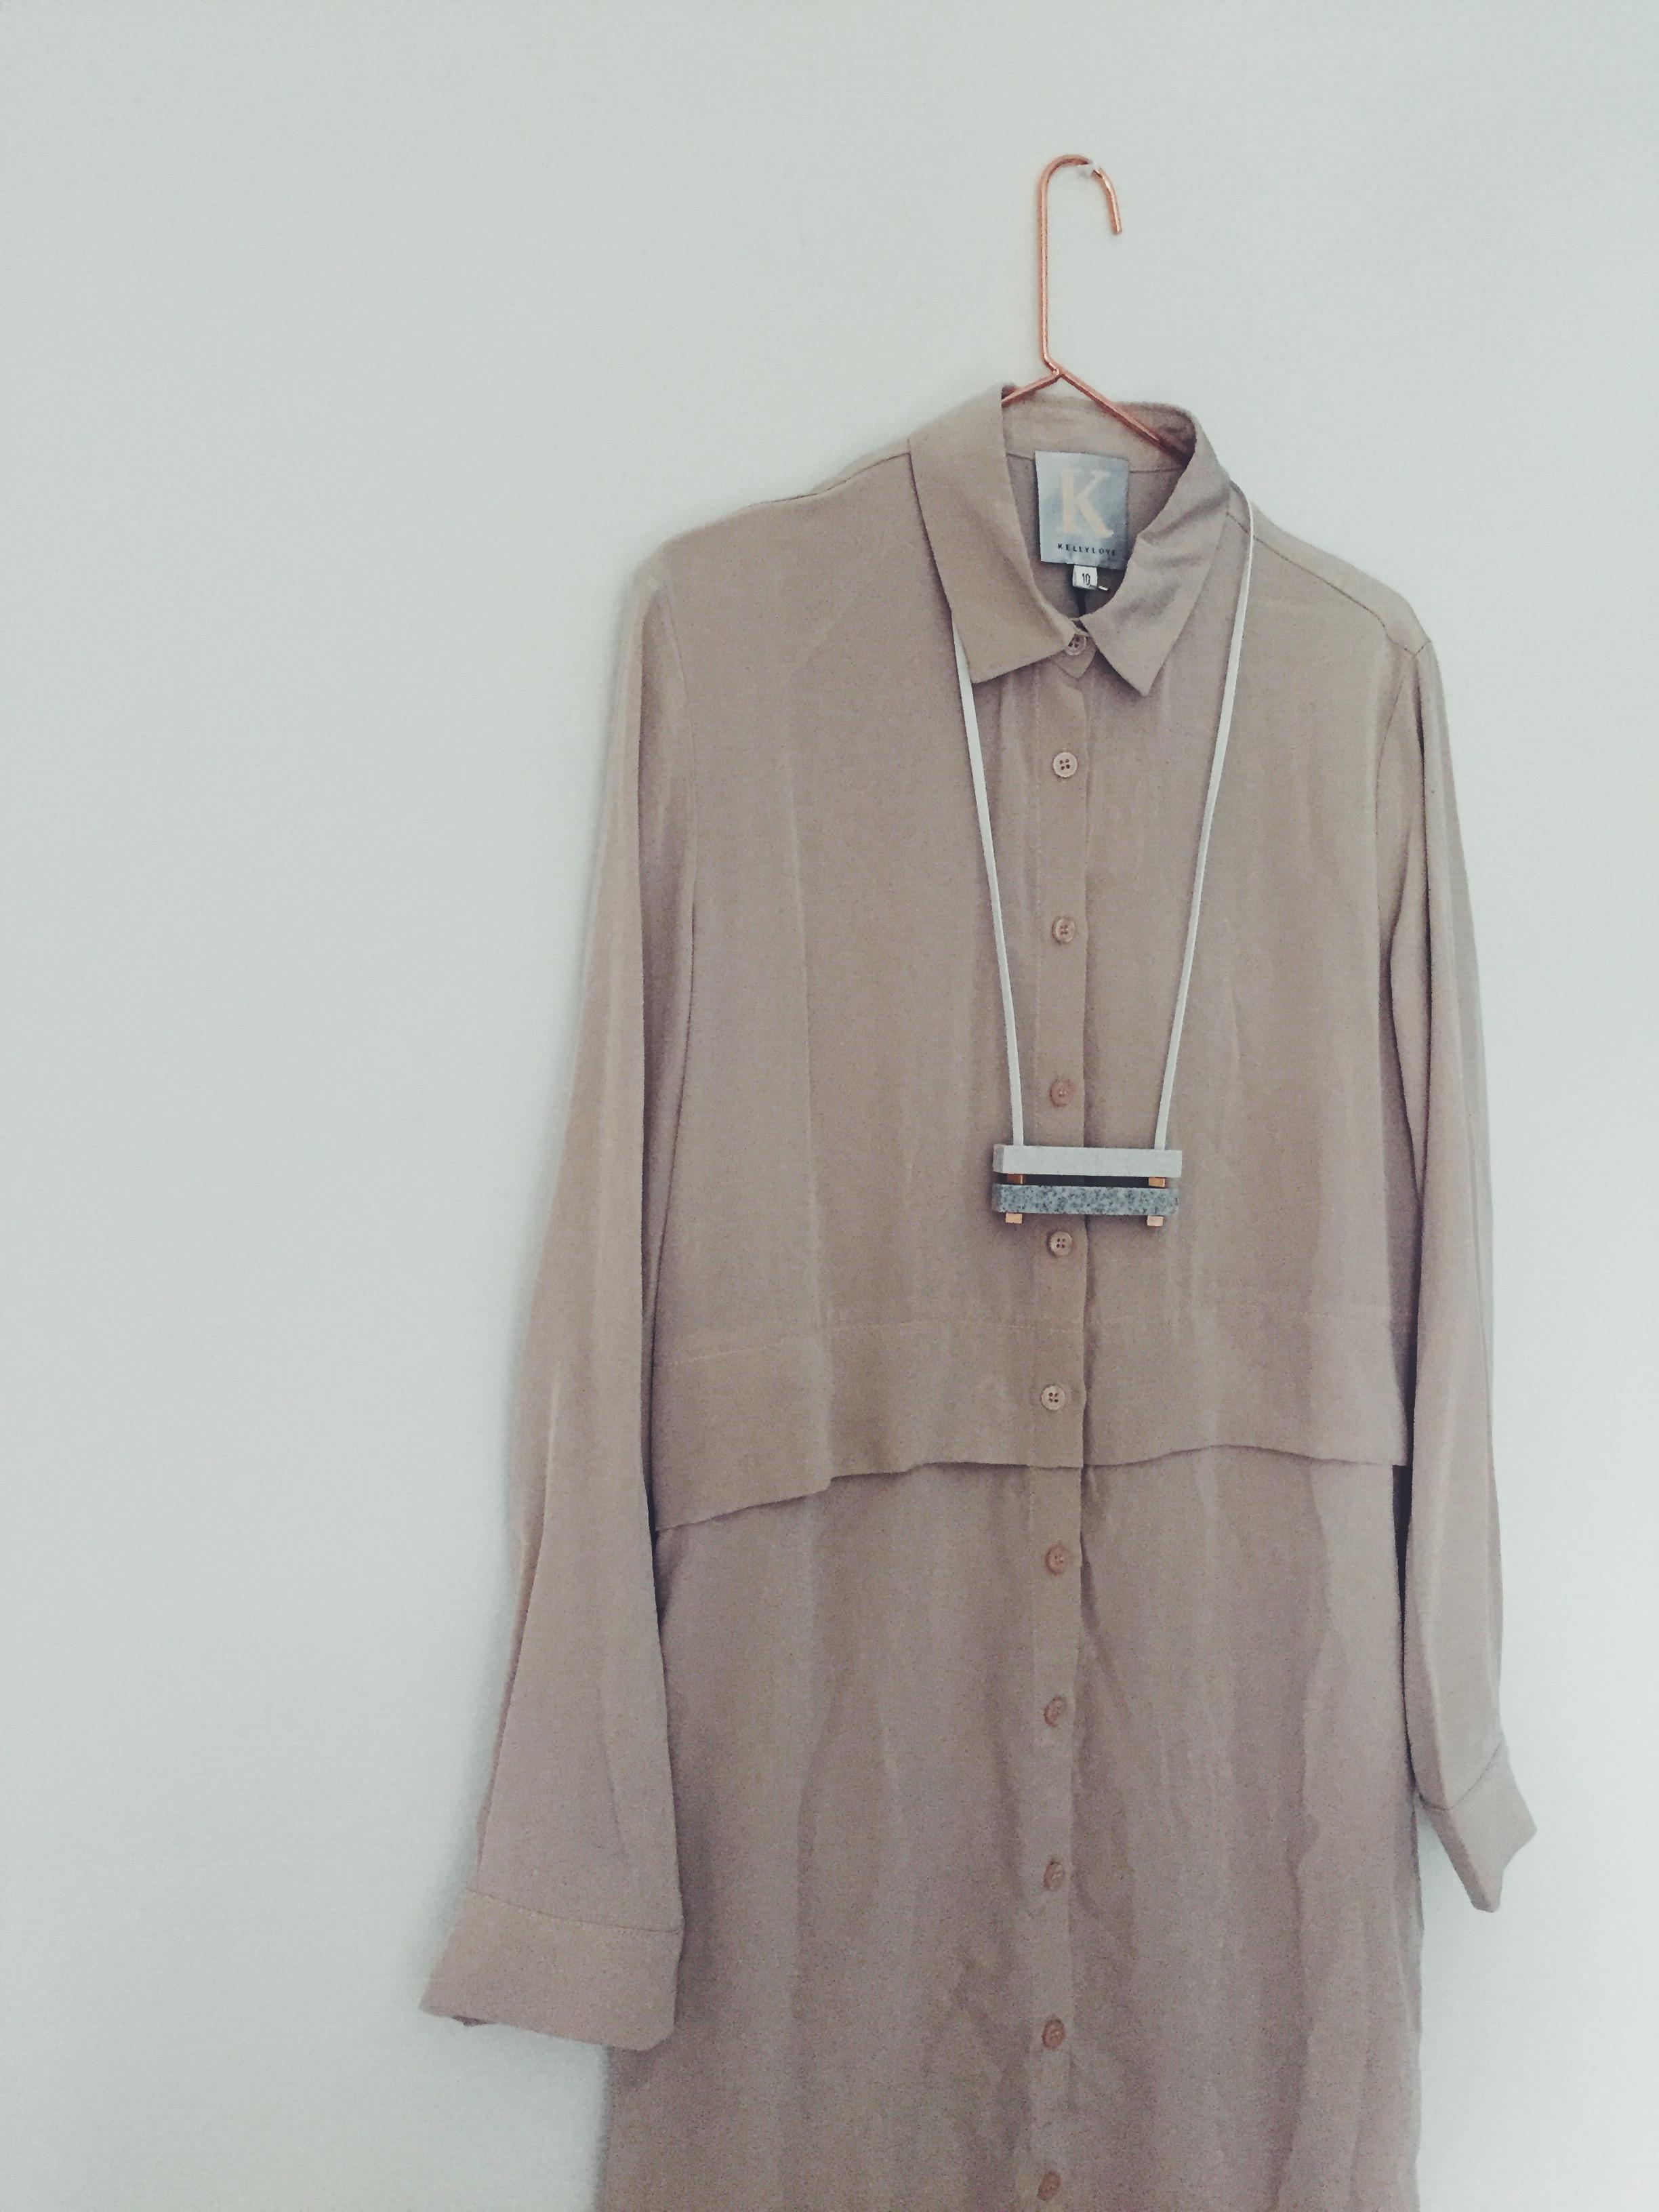 OBJECT STYLE KELLY LOVE NUDE SILK SHIRT DRESS